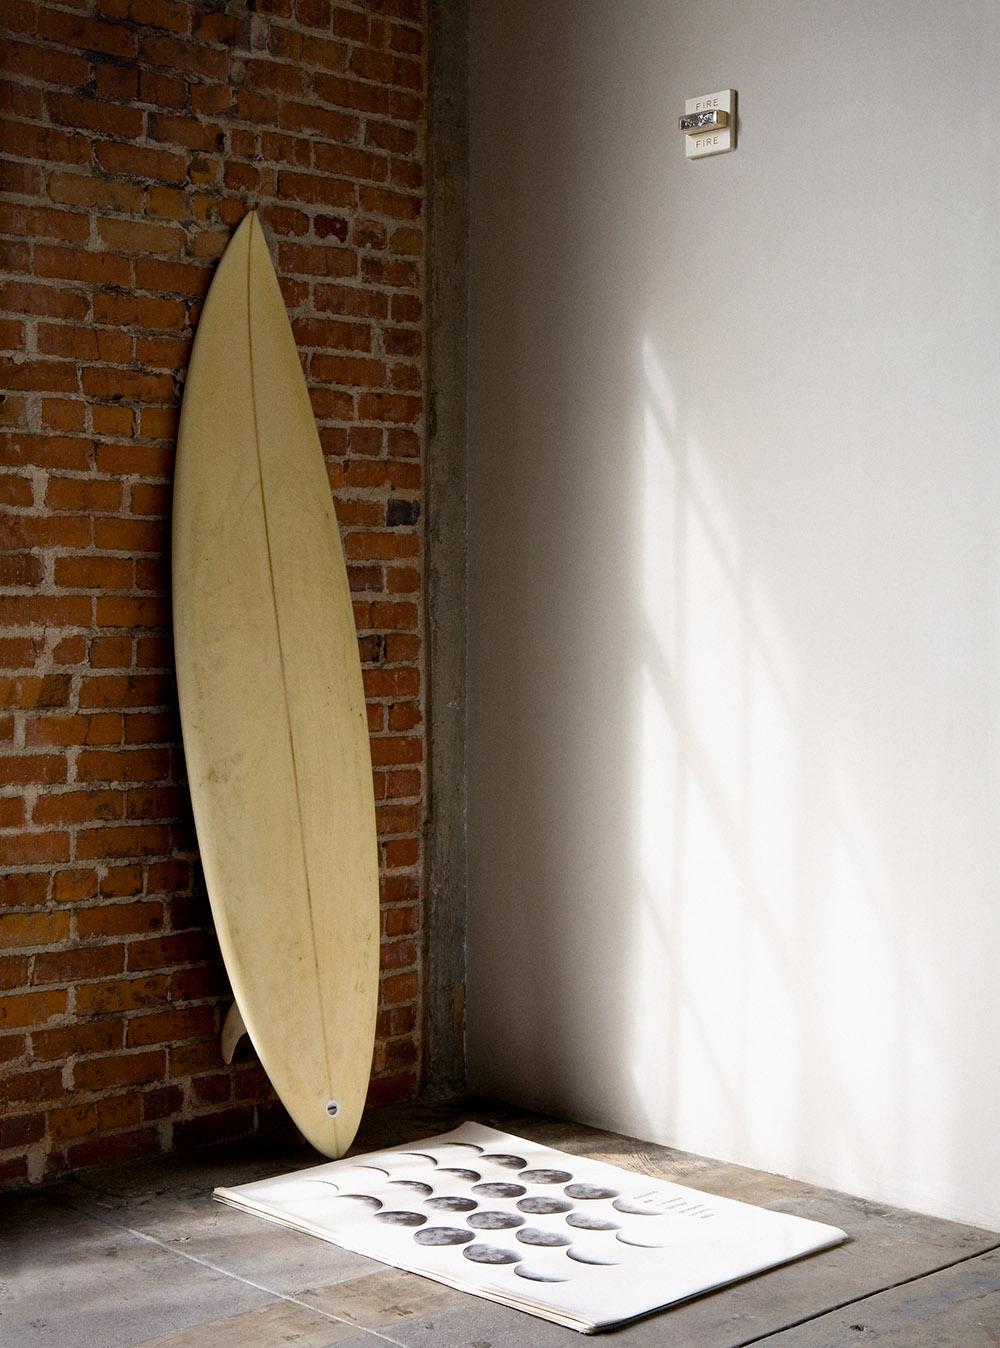 christina's surfboard